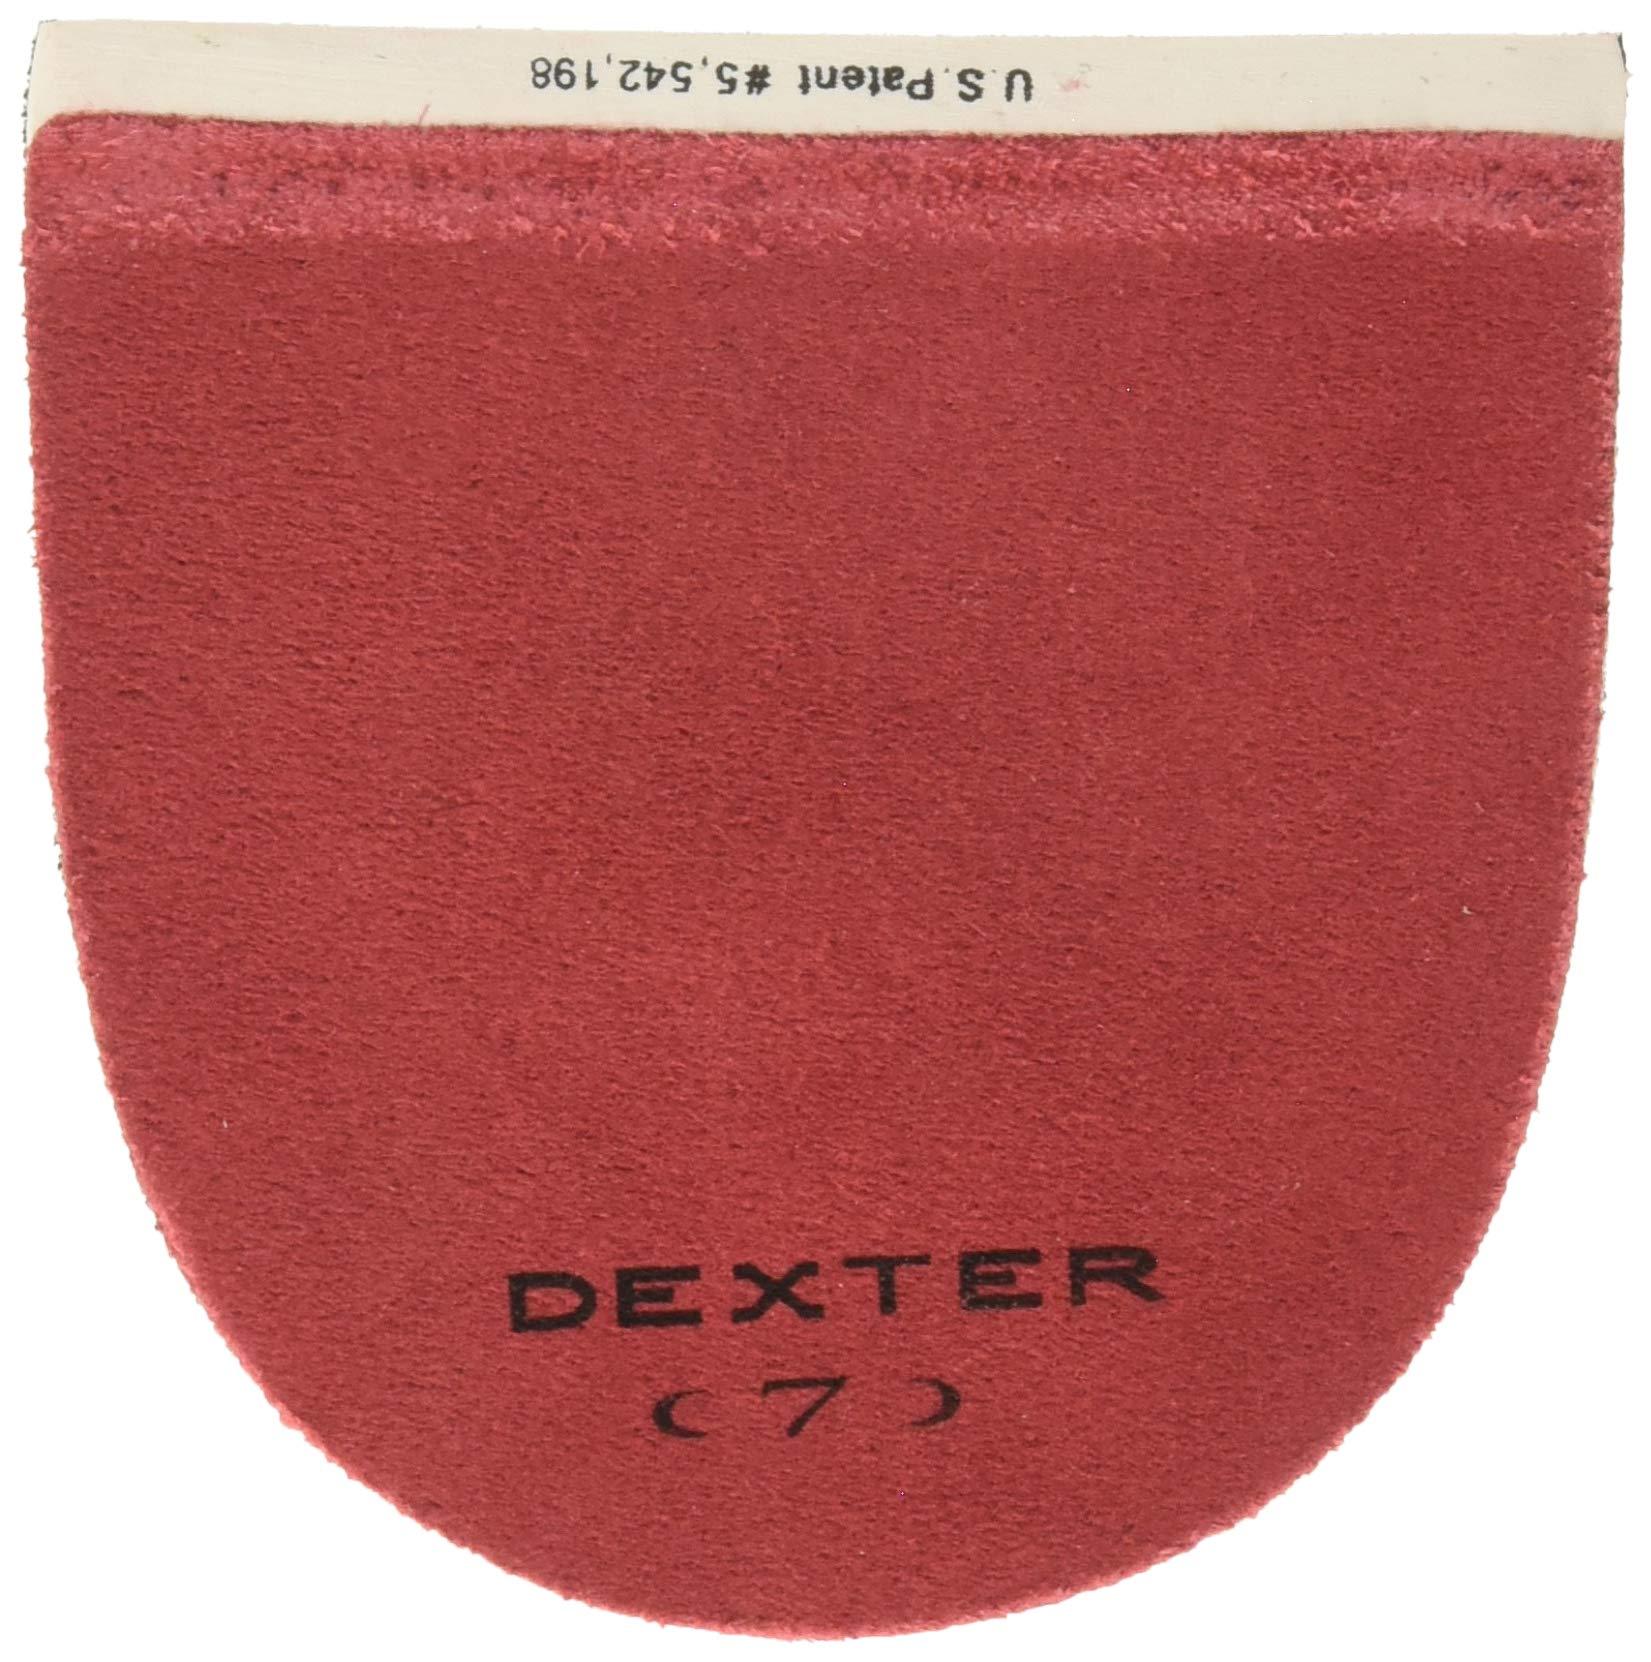 s10 Felt Sole Dexter Accessories Unisex